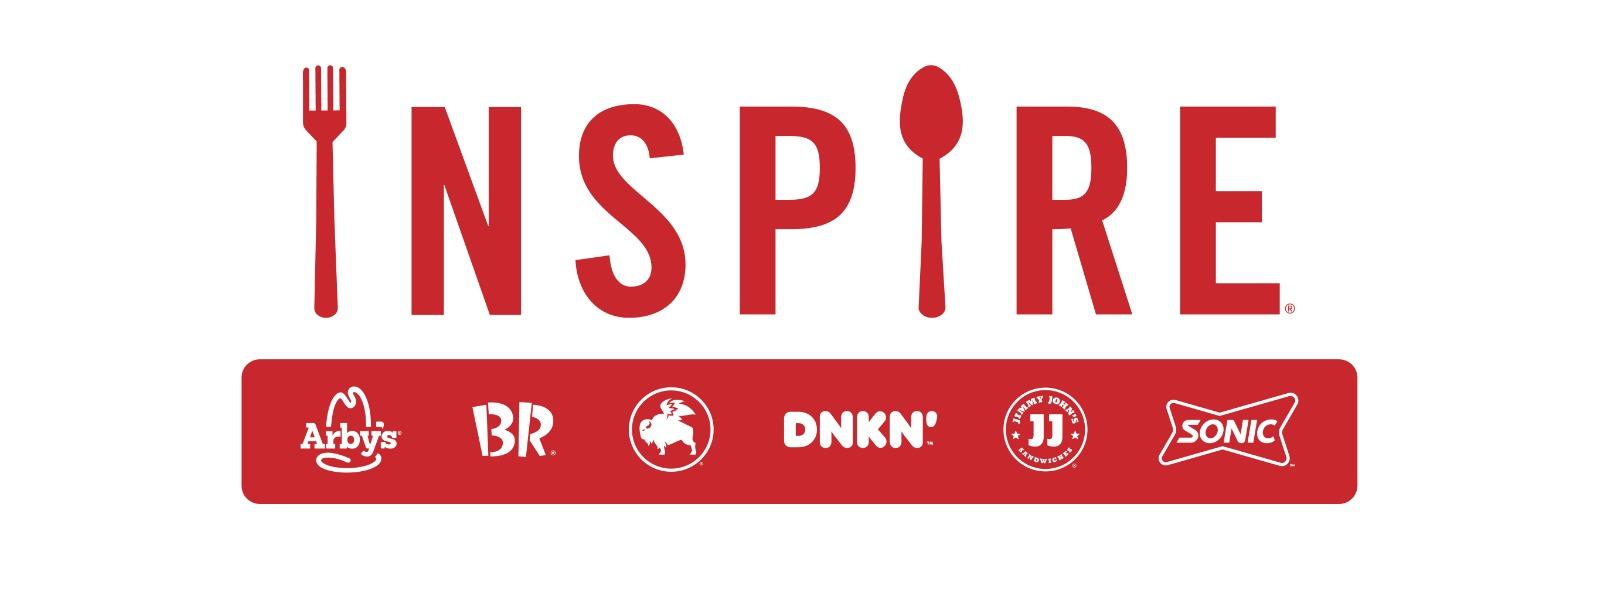 Inspire-acquires-Dunkin-Baskin-Robbins